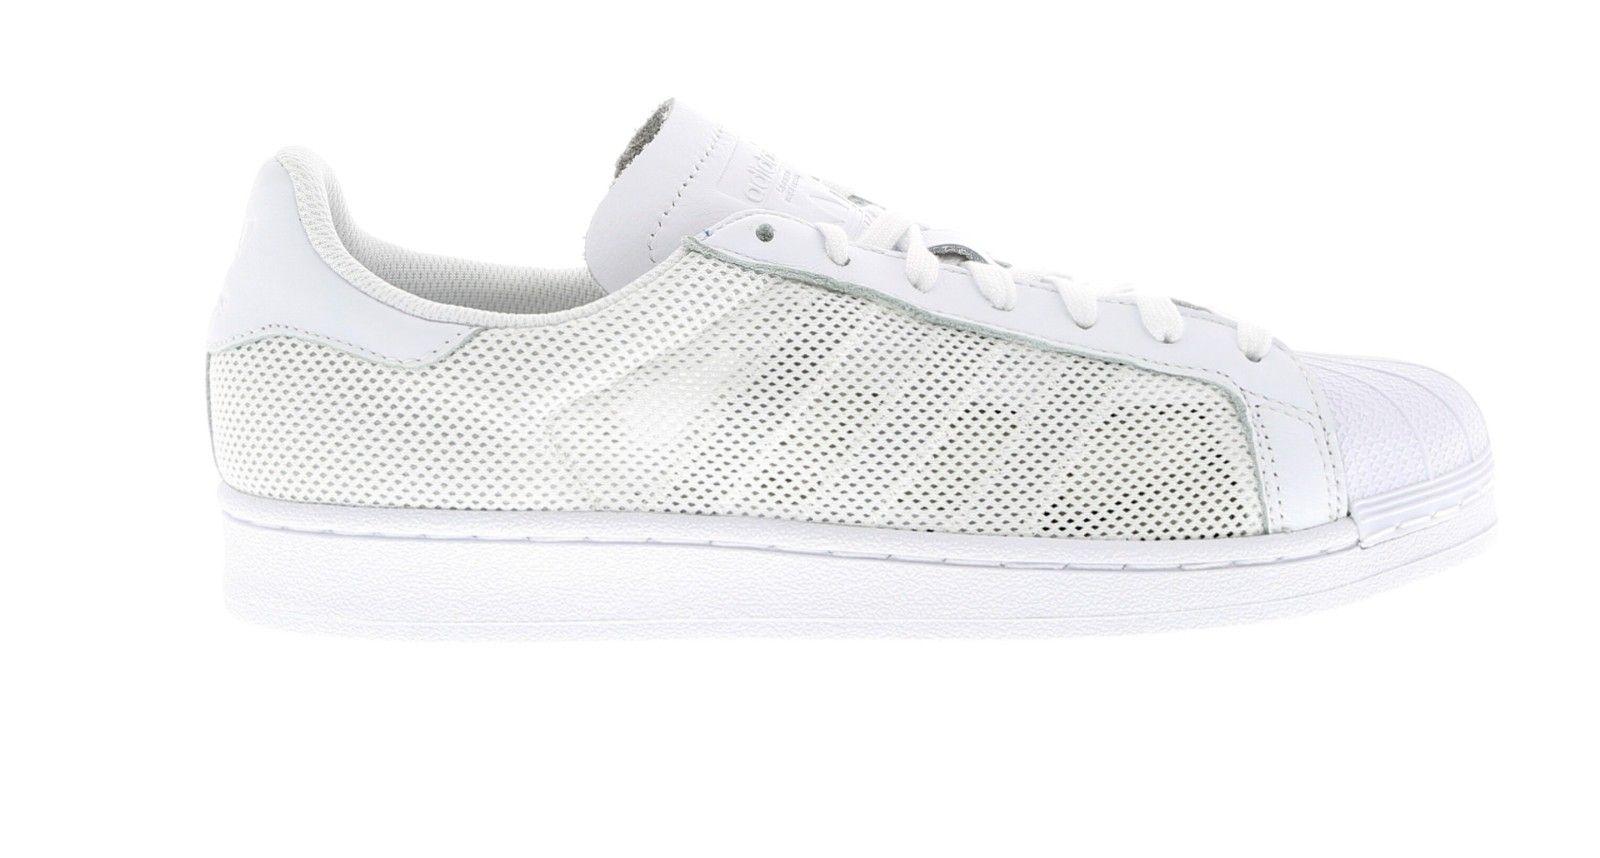 343e4a847 adidas Originals Superstar BB0993 męskie r 43 1/3 - 7389219838 ...